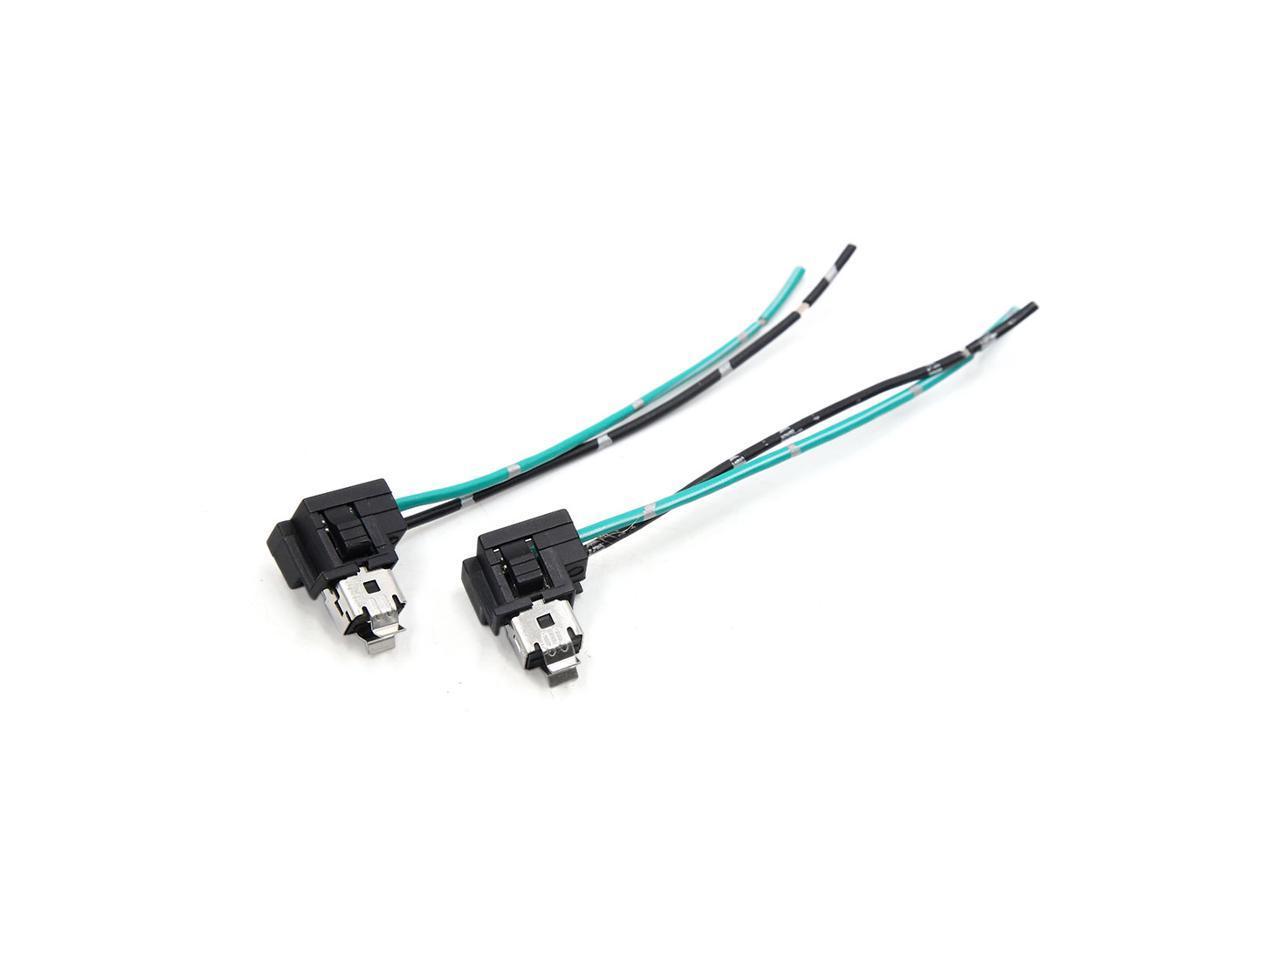 10pcs H1 Headlight Fog Lamp Extension Wiring Harness